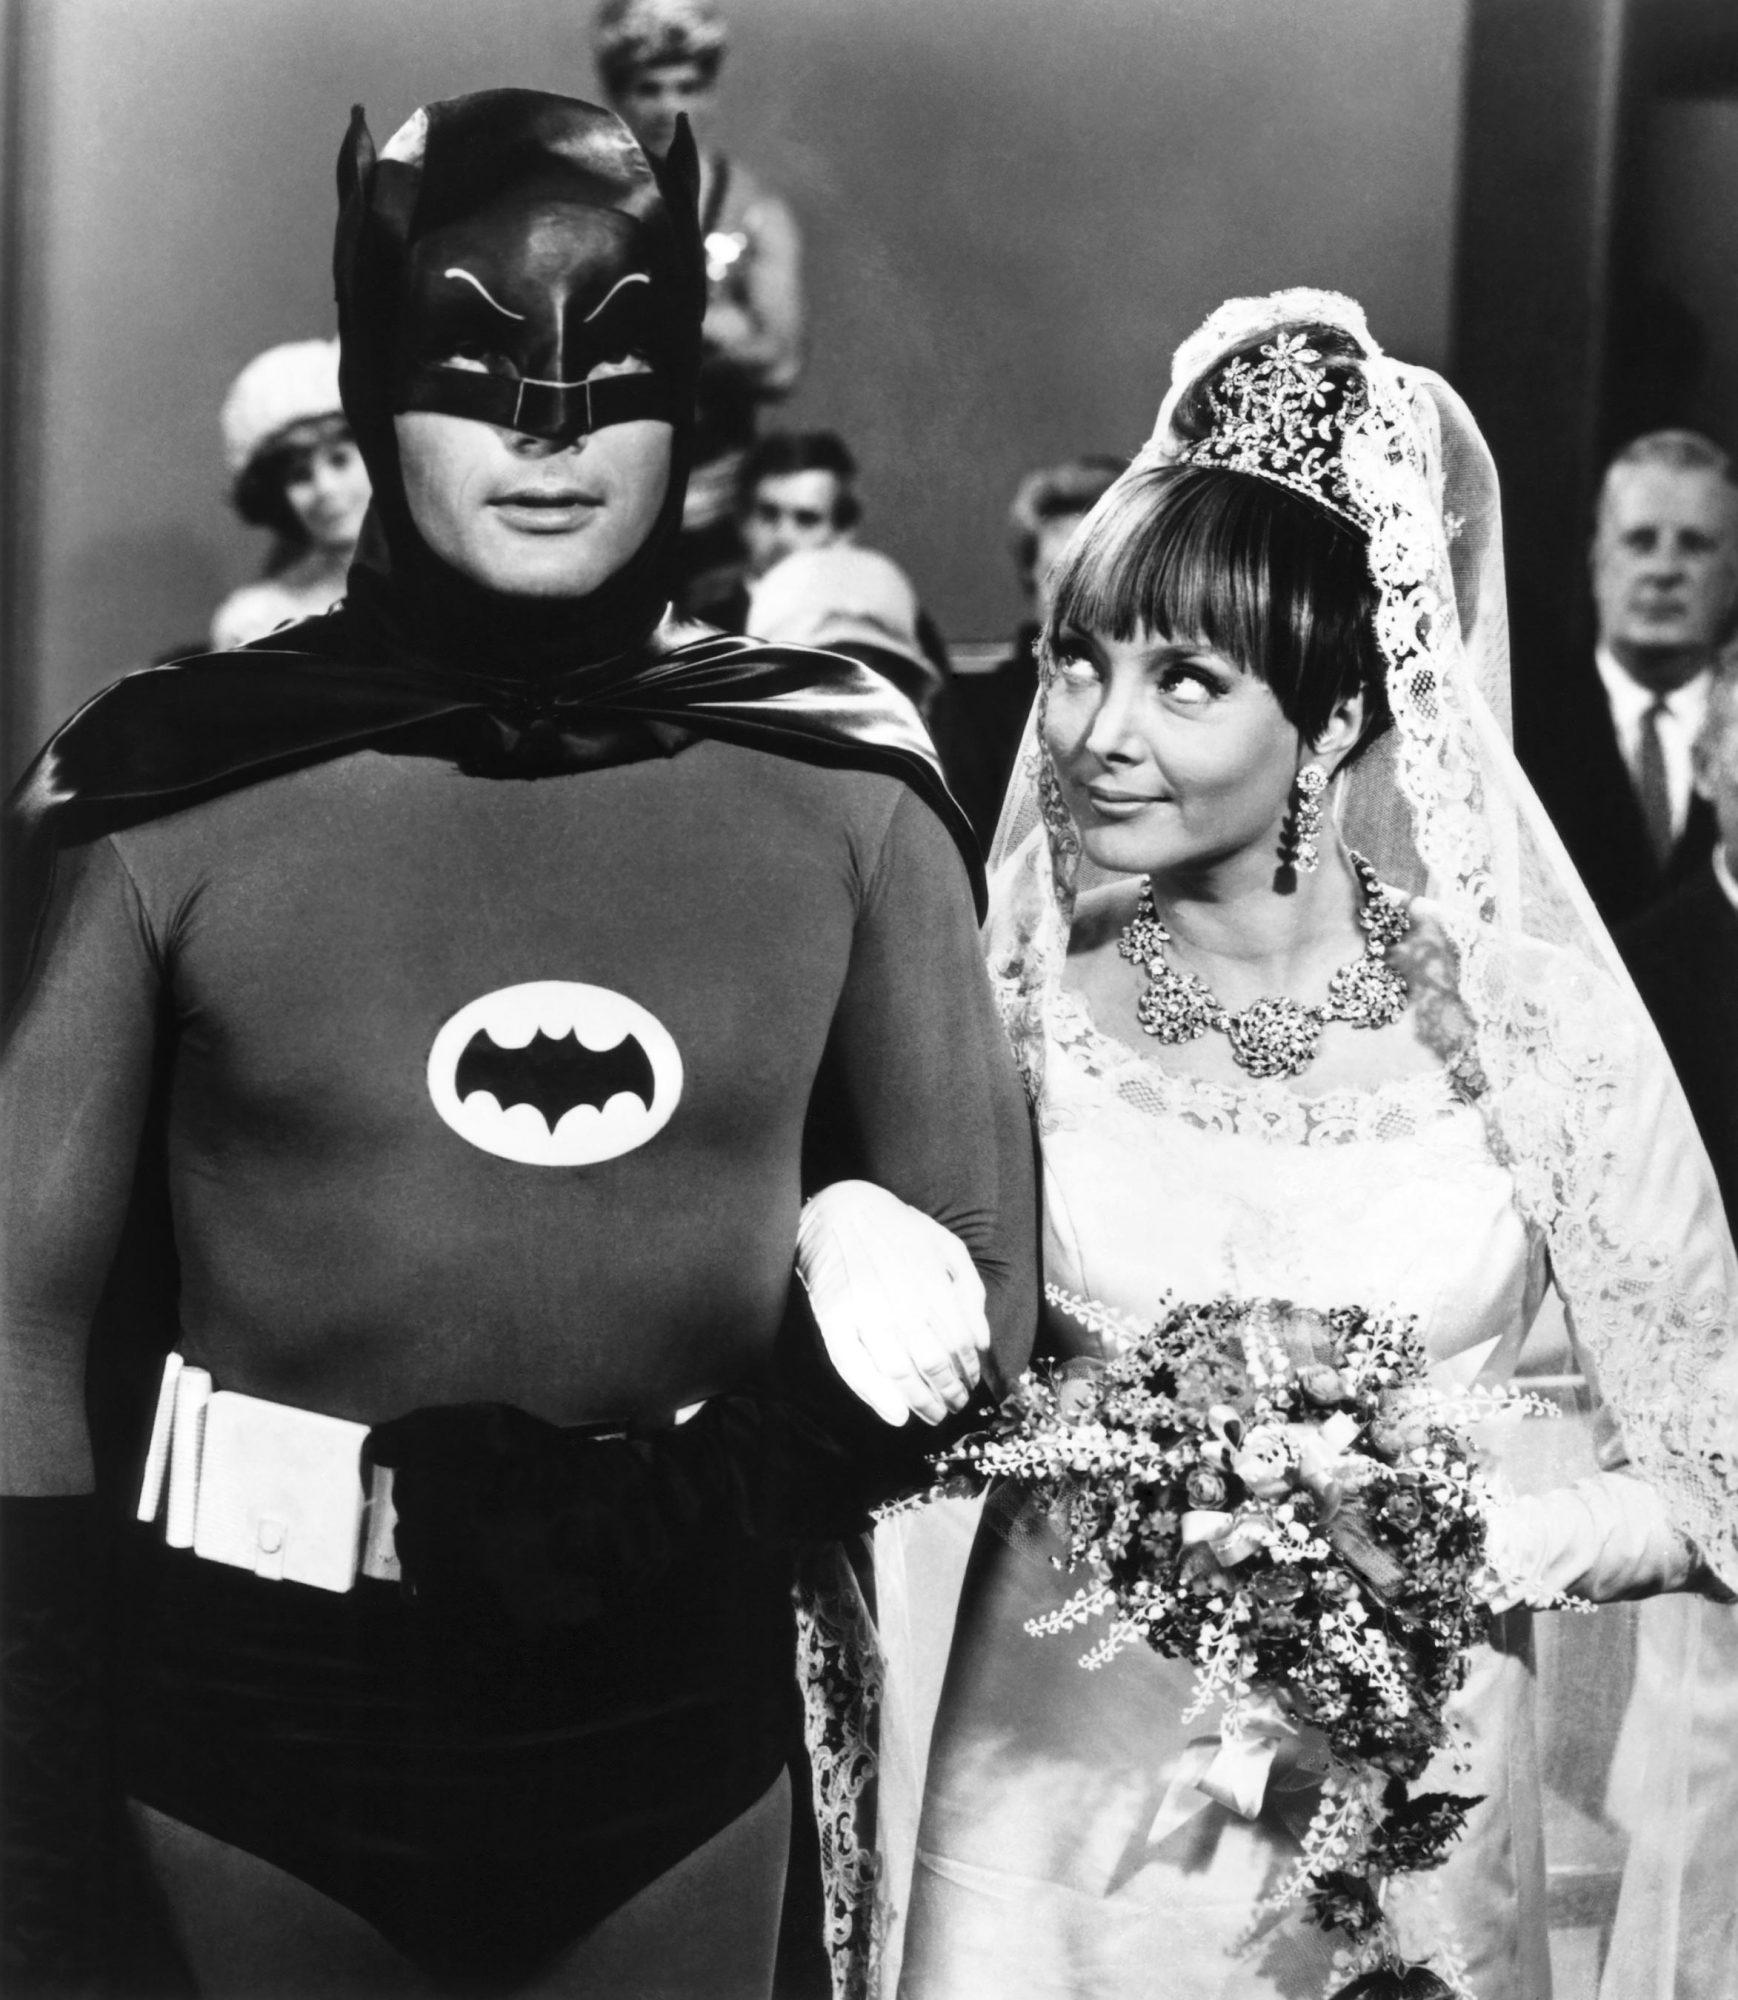 BATMAN, (from left): Adam West, Carolyn Jones, (Season 2, ep. 223, aired Nov. 23, 1966), 1966-68. TM